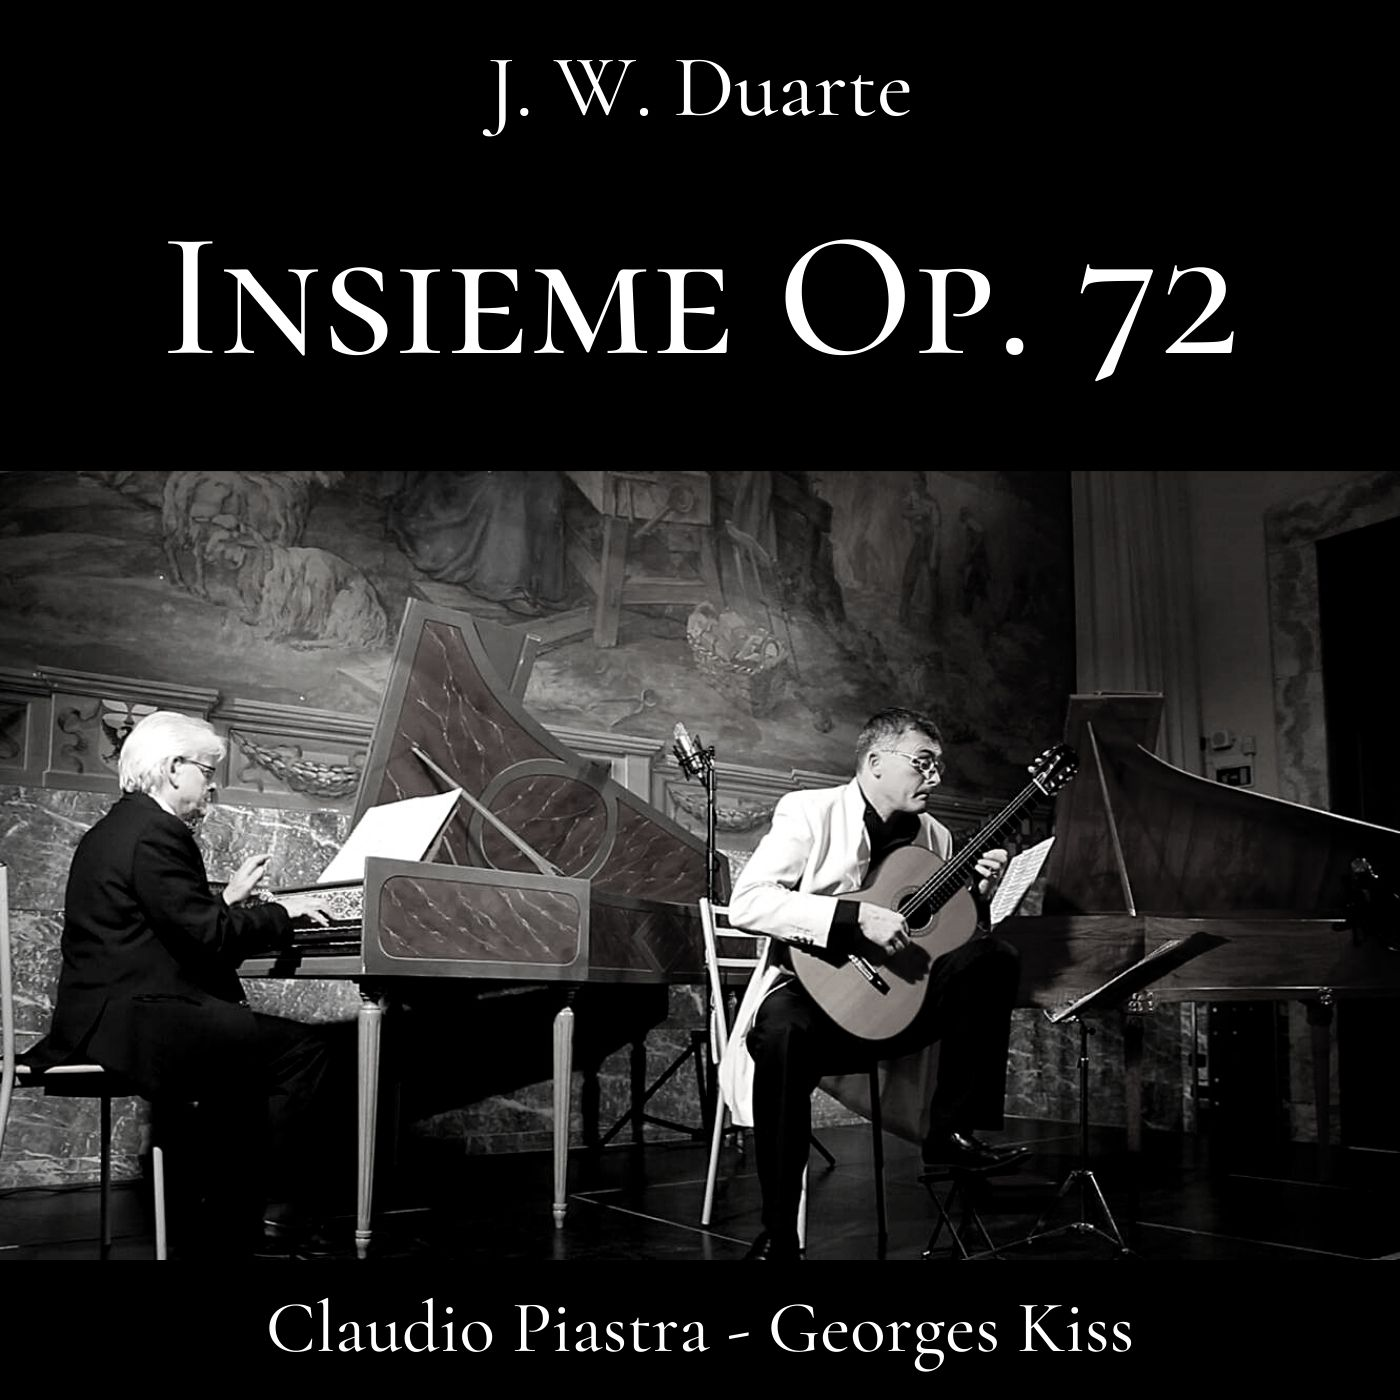 Insieme, Op. 72 for Guitar & Harpsichord